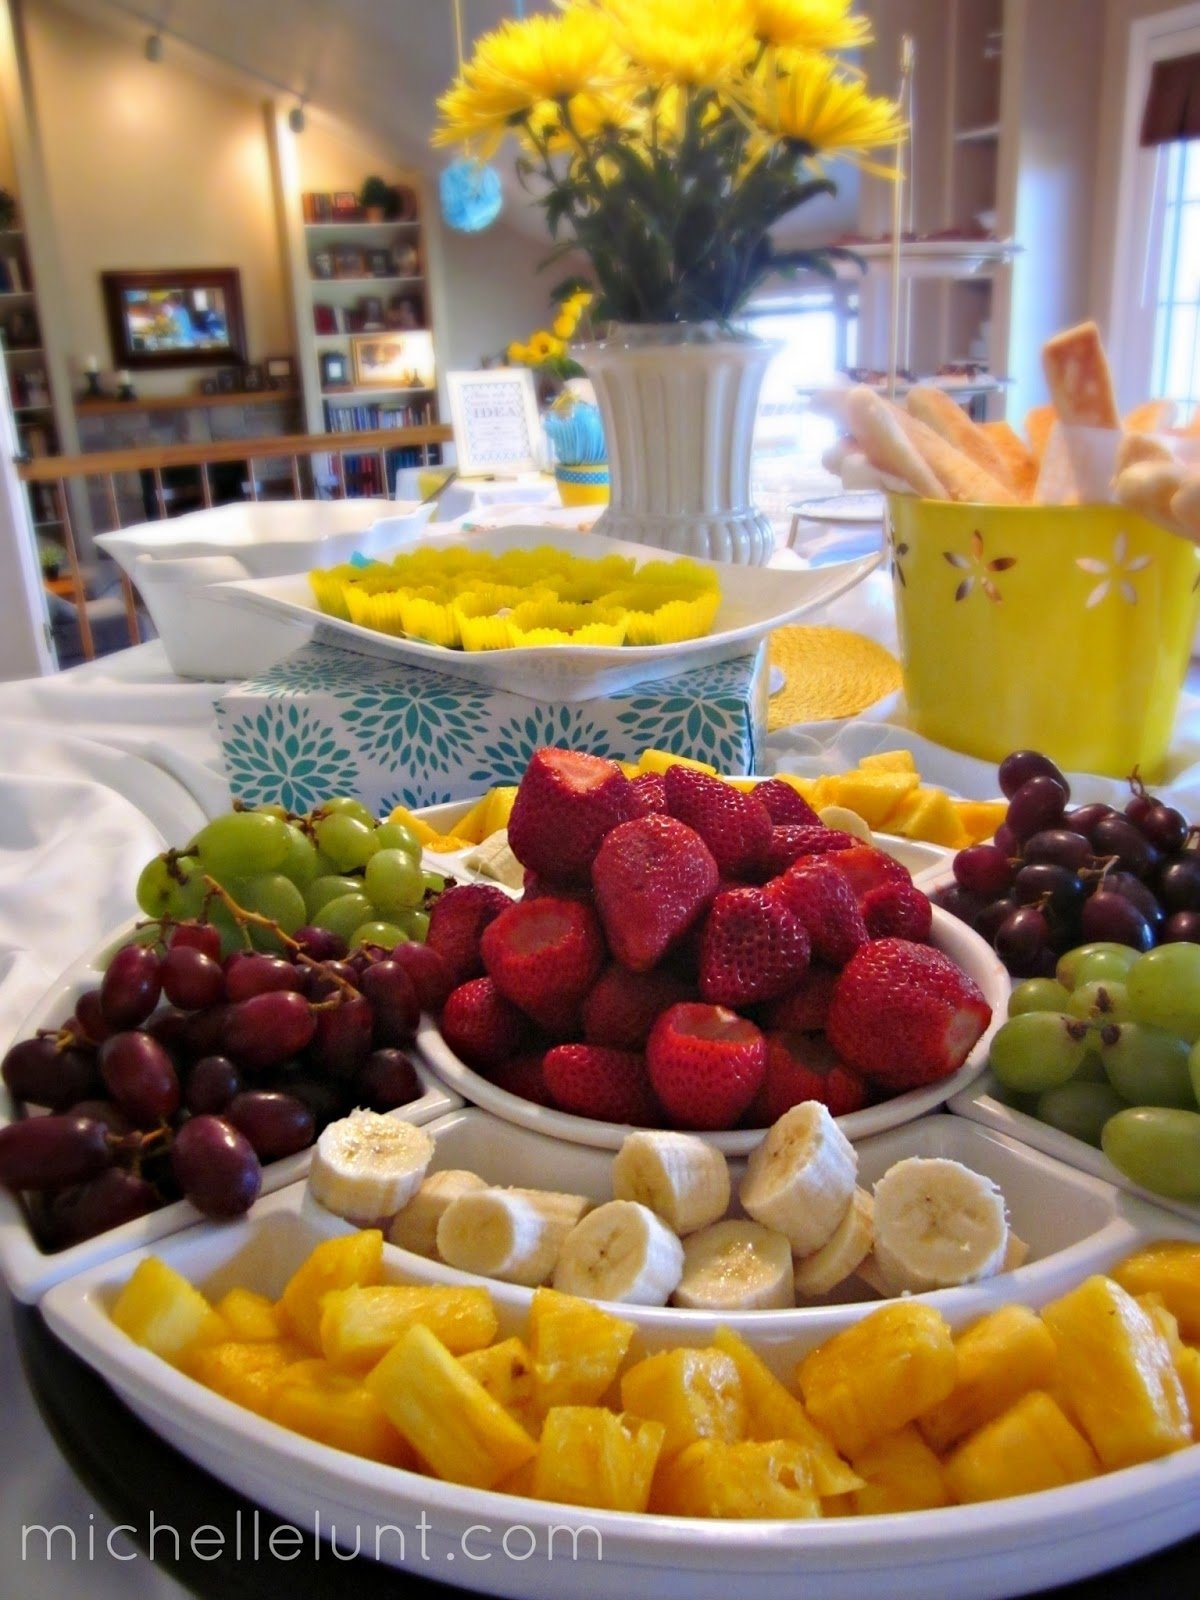 10 Lovable Brunch Menu Ideas Martha Stewart photo bridal shower food on image 2 2020